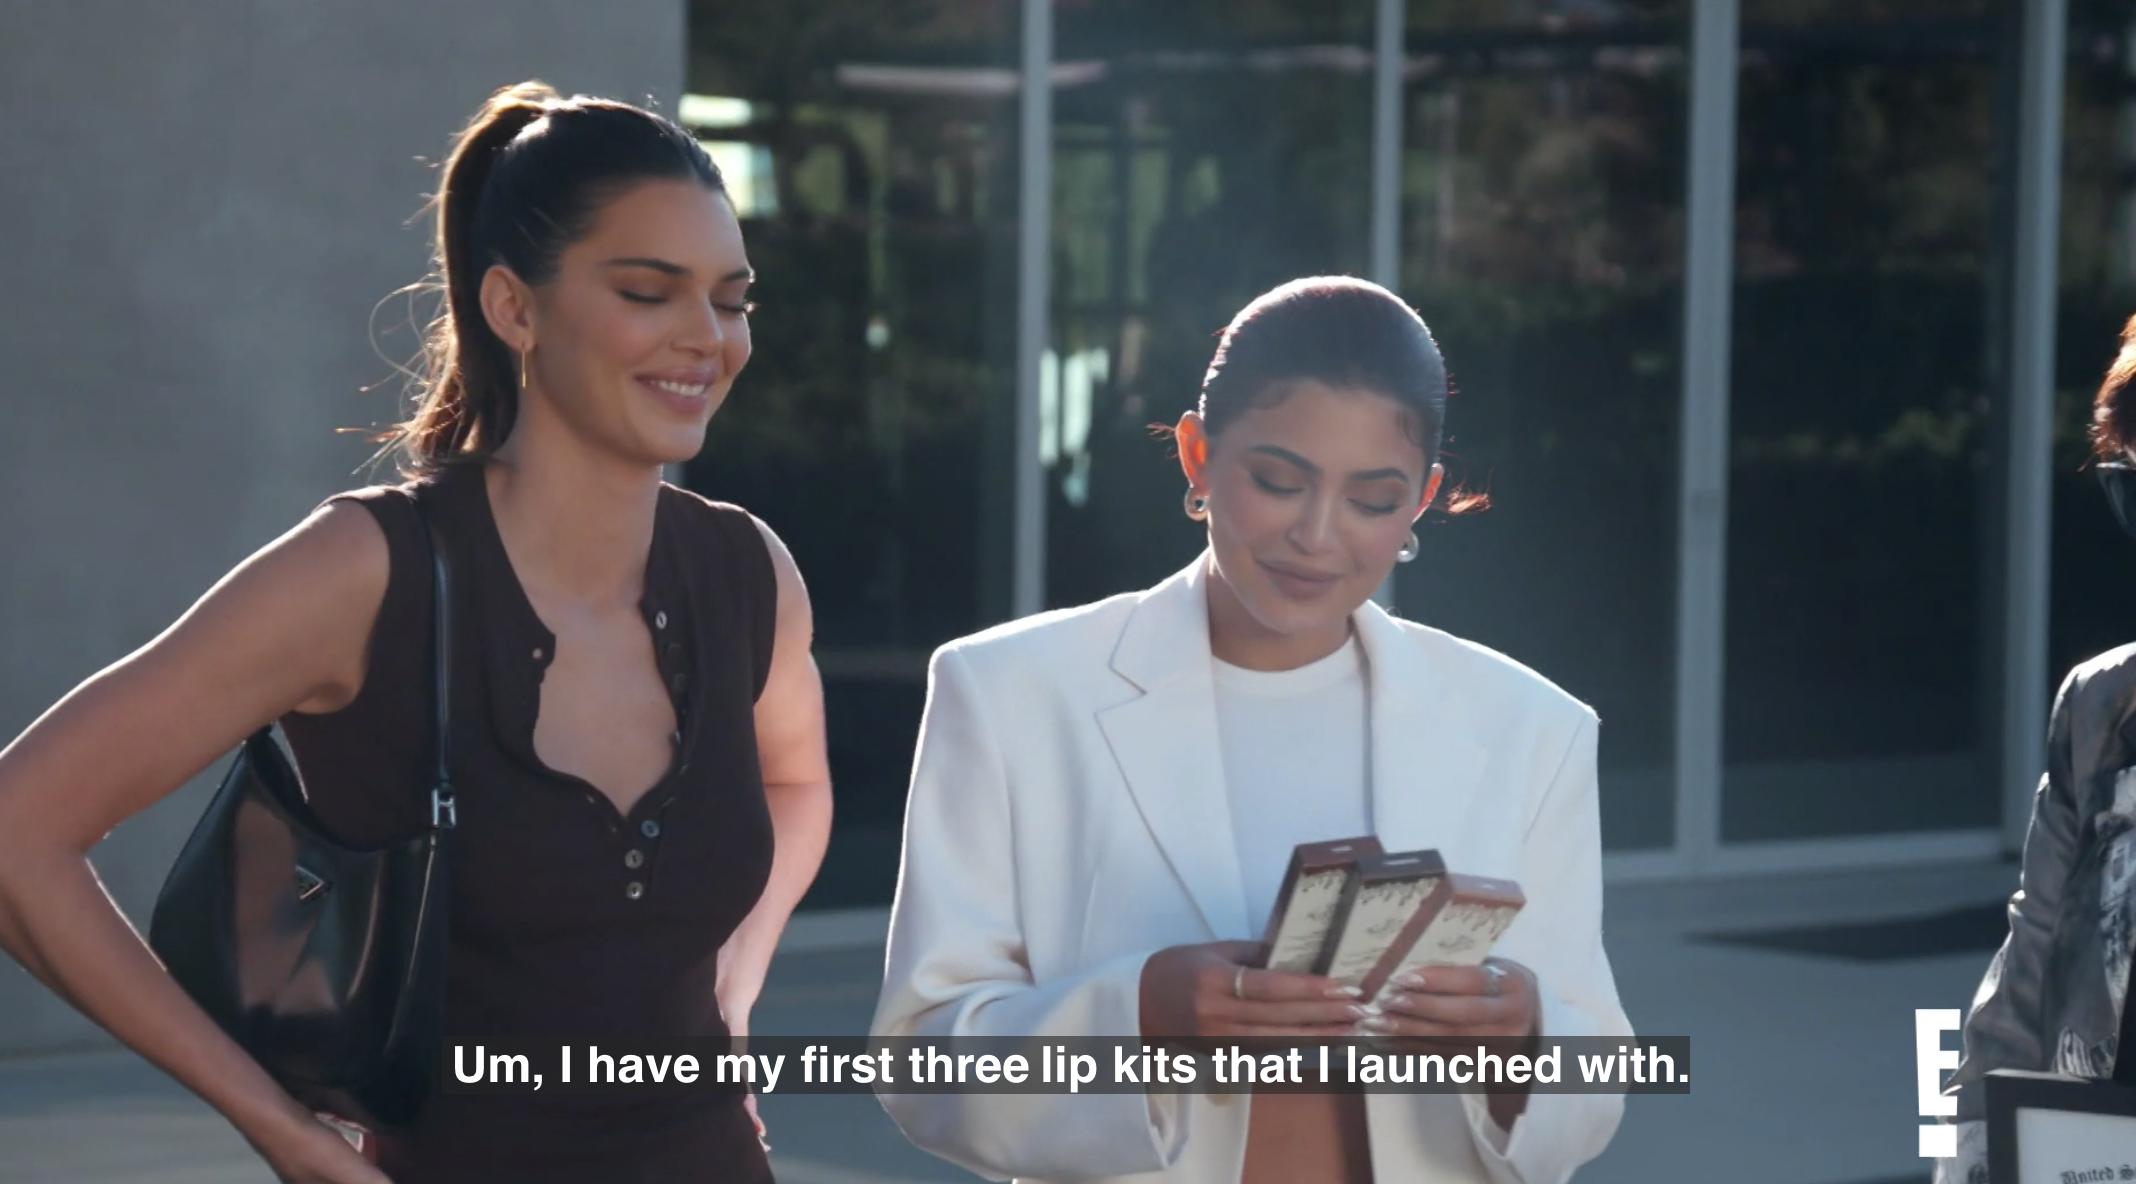 Kylie's lip kits